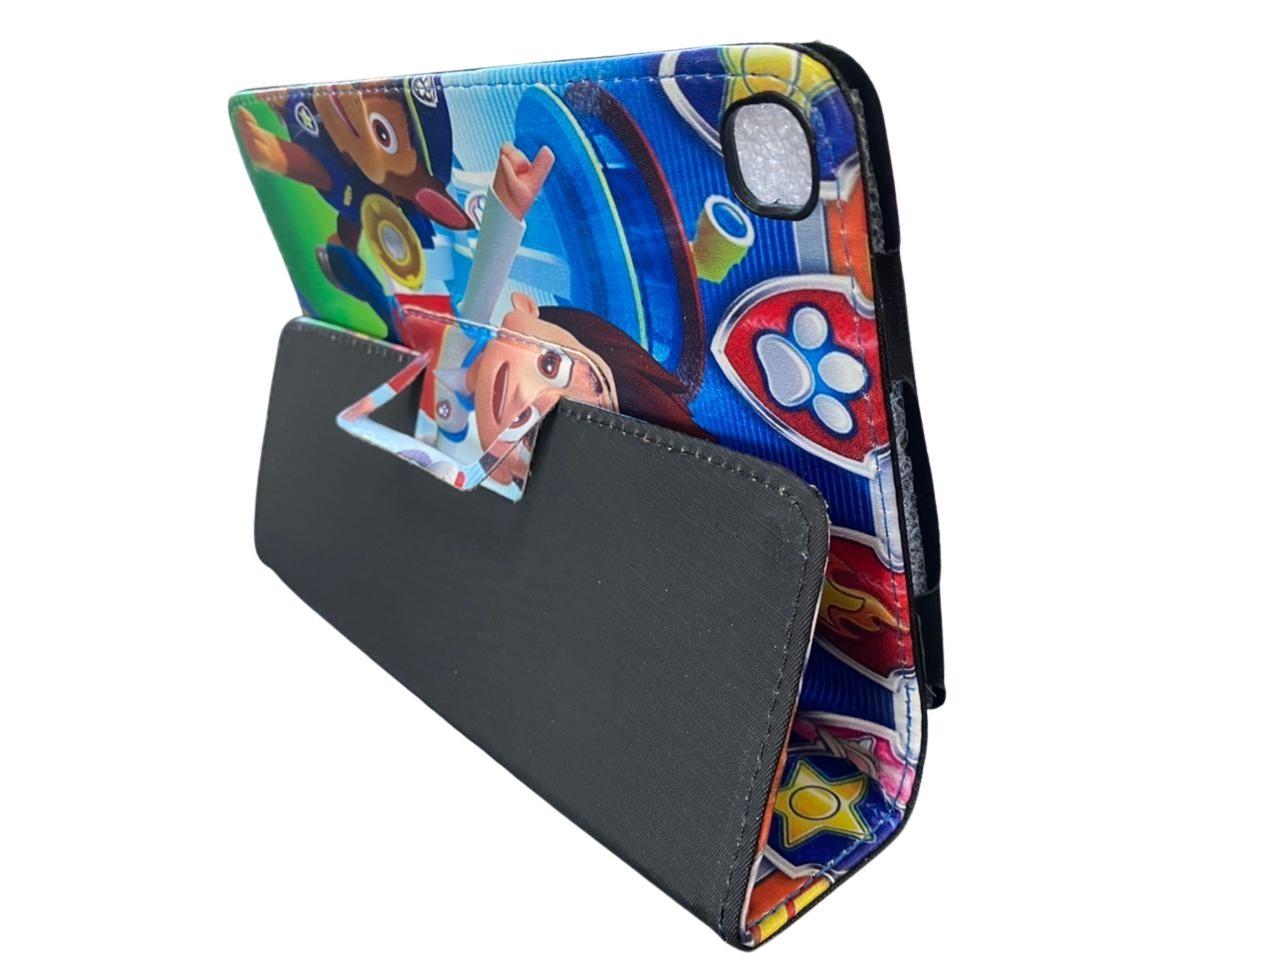 Capa Tablet Samsung Galaxy Tab A 8 T290 T295 Magnética Patrulha Canina